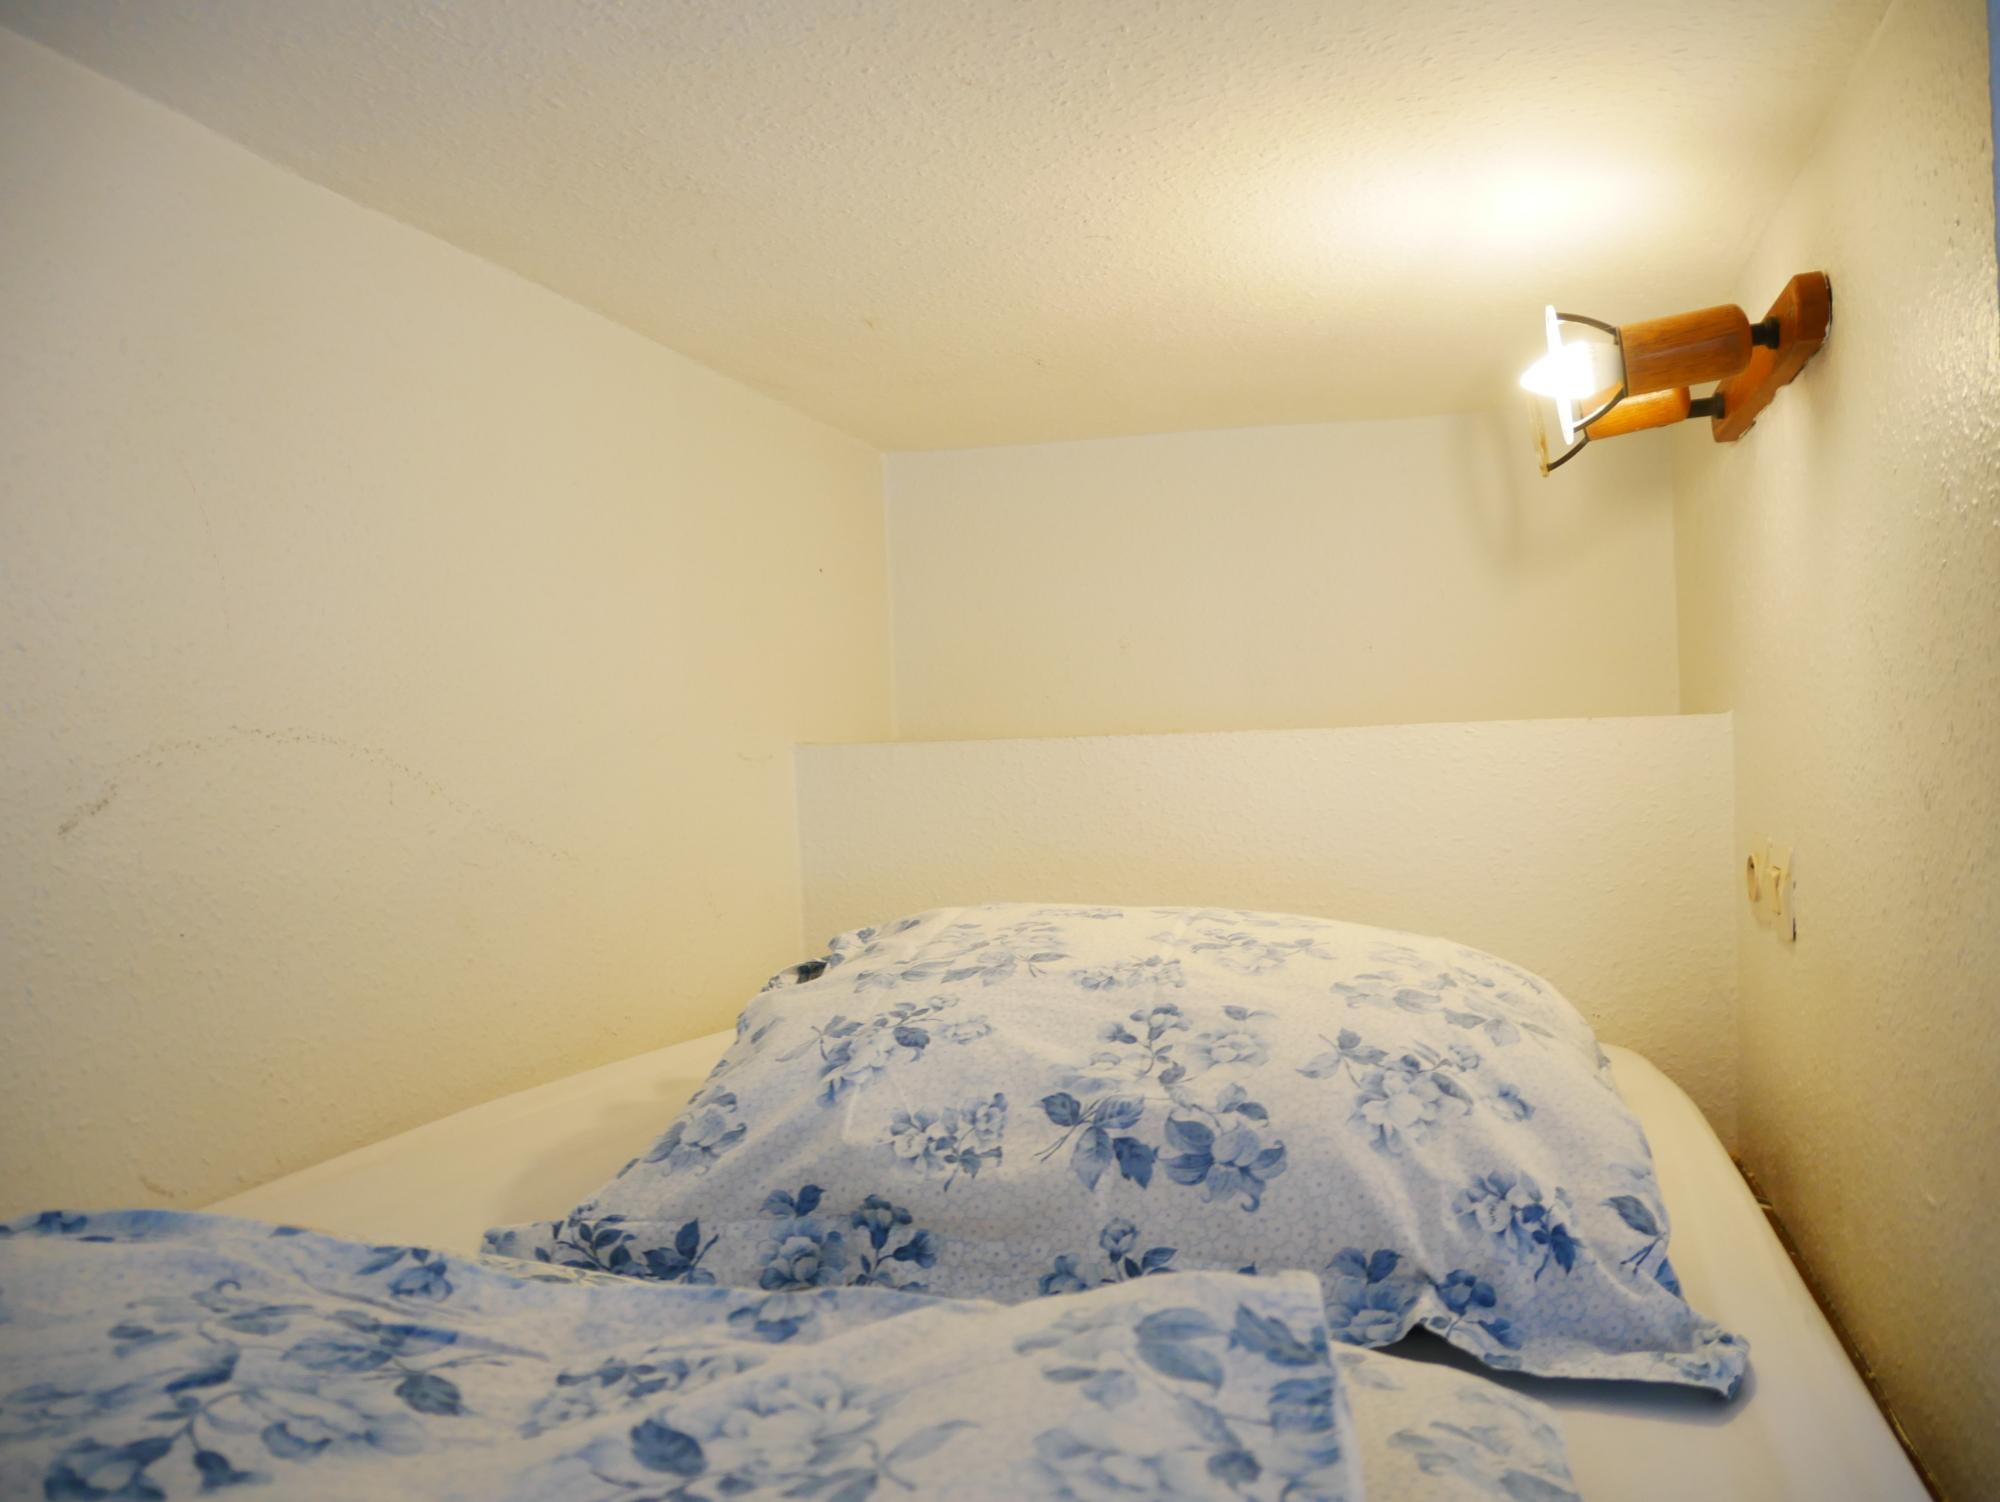 [Tiny] Chambre meublée - Av. des Vosges / rue Sellenick - nos locations - Beausite Immobilier 4